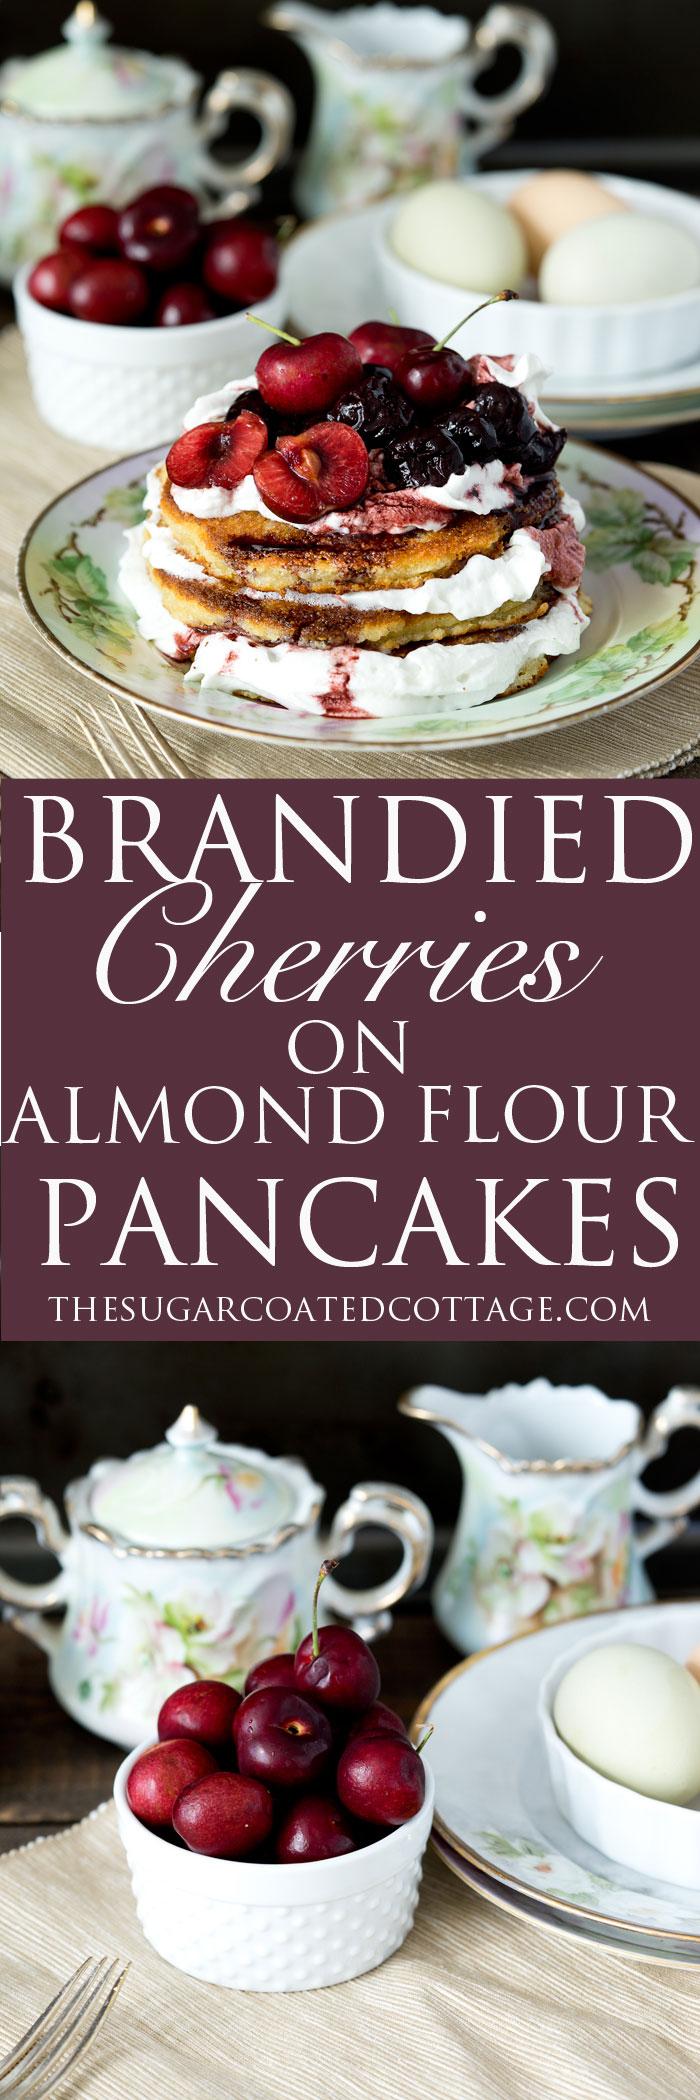 Brandy Cherry Compote on Almond Flour Pancakes